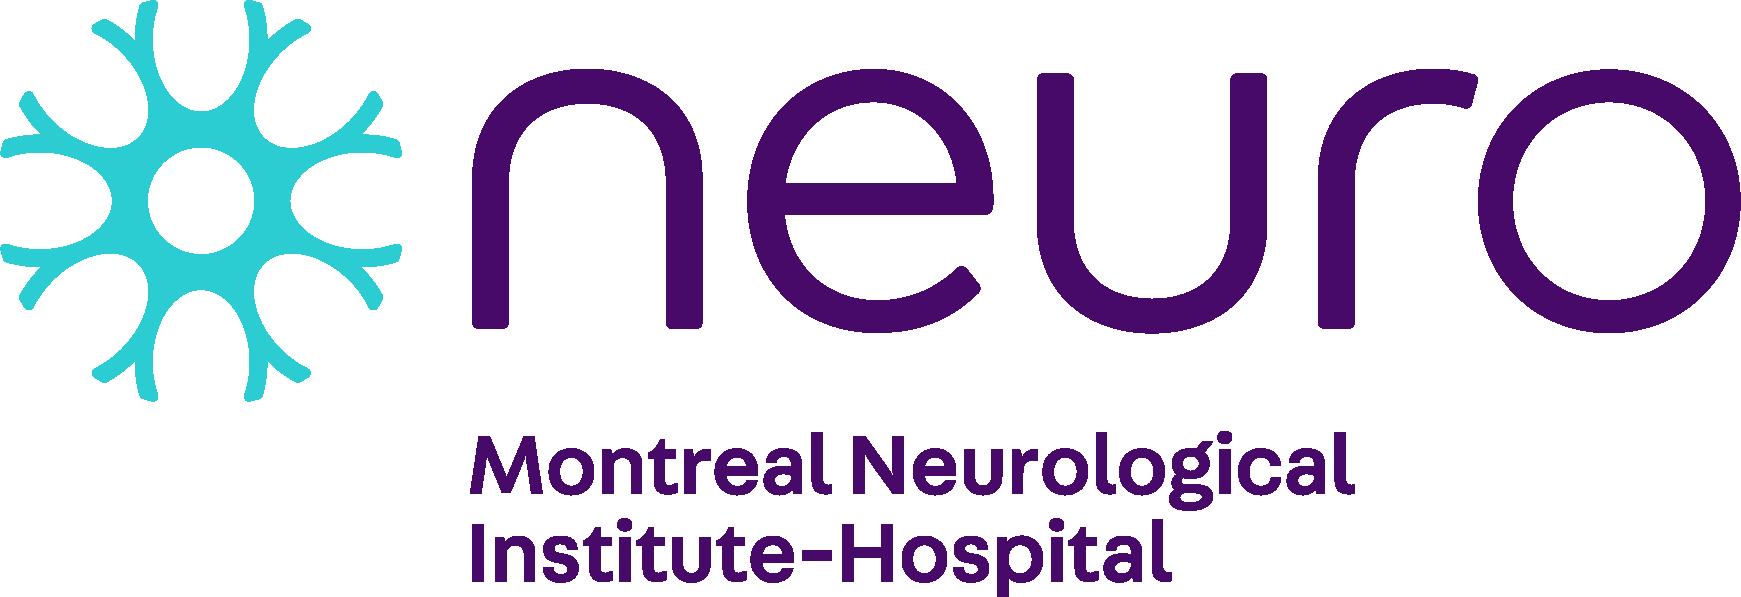 The Neuro logo